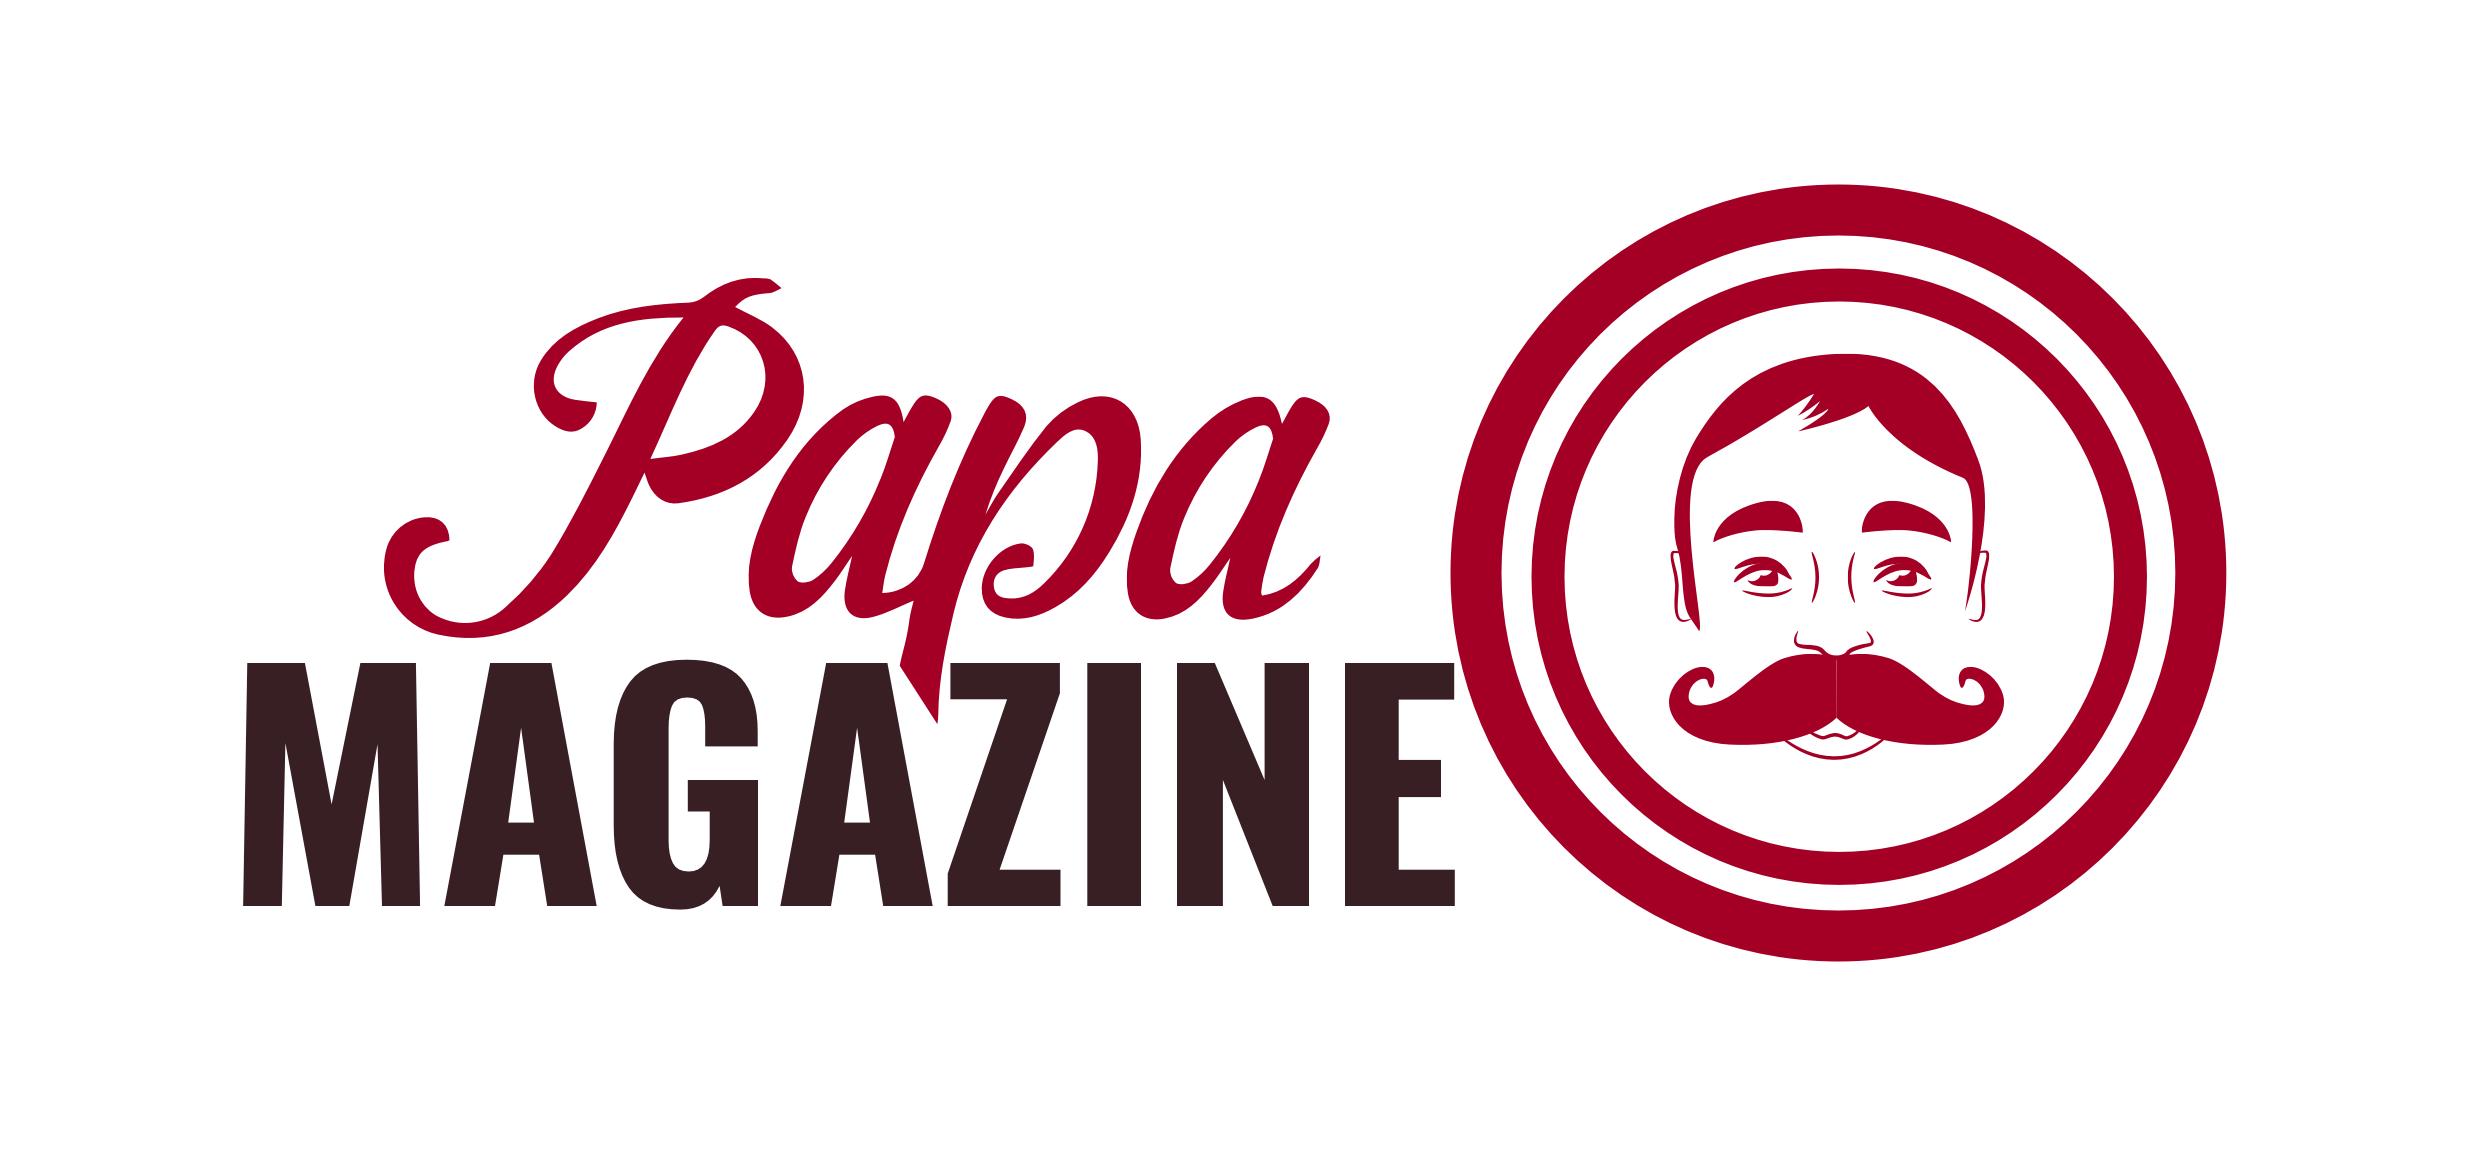 Papadrinks Magazine – Guide shopping Vins, bières et spiritueux